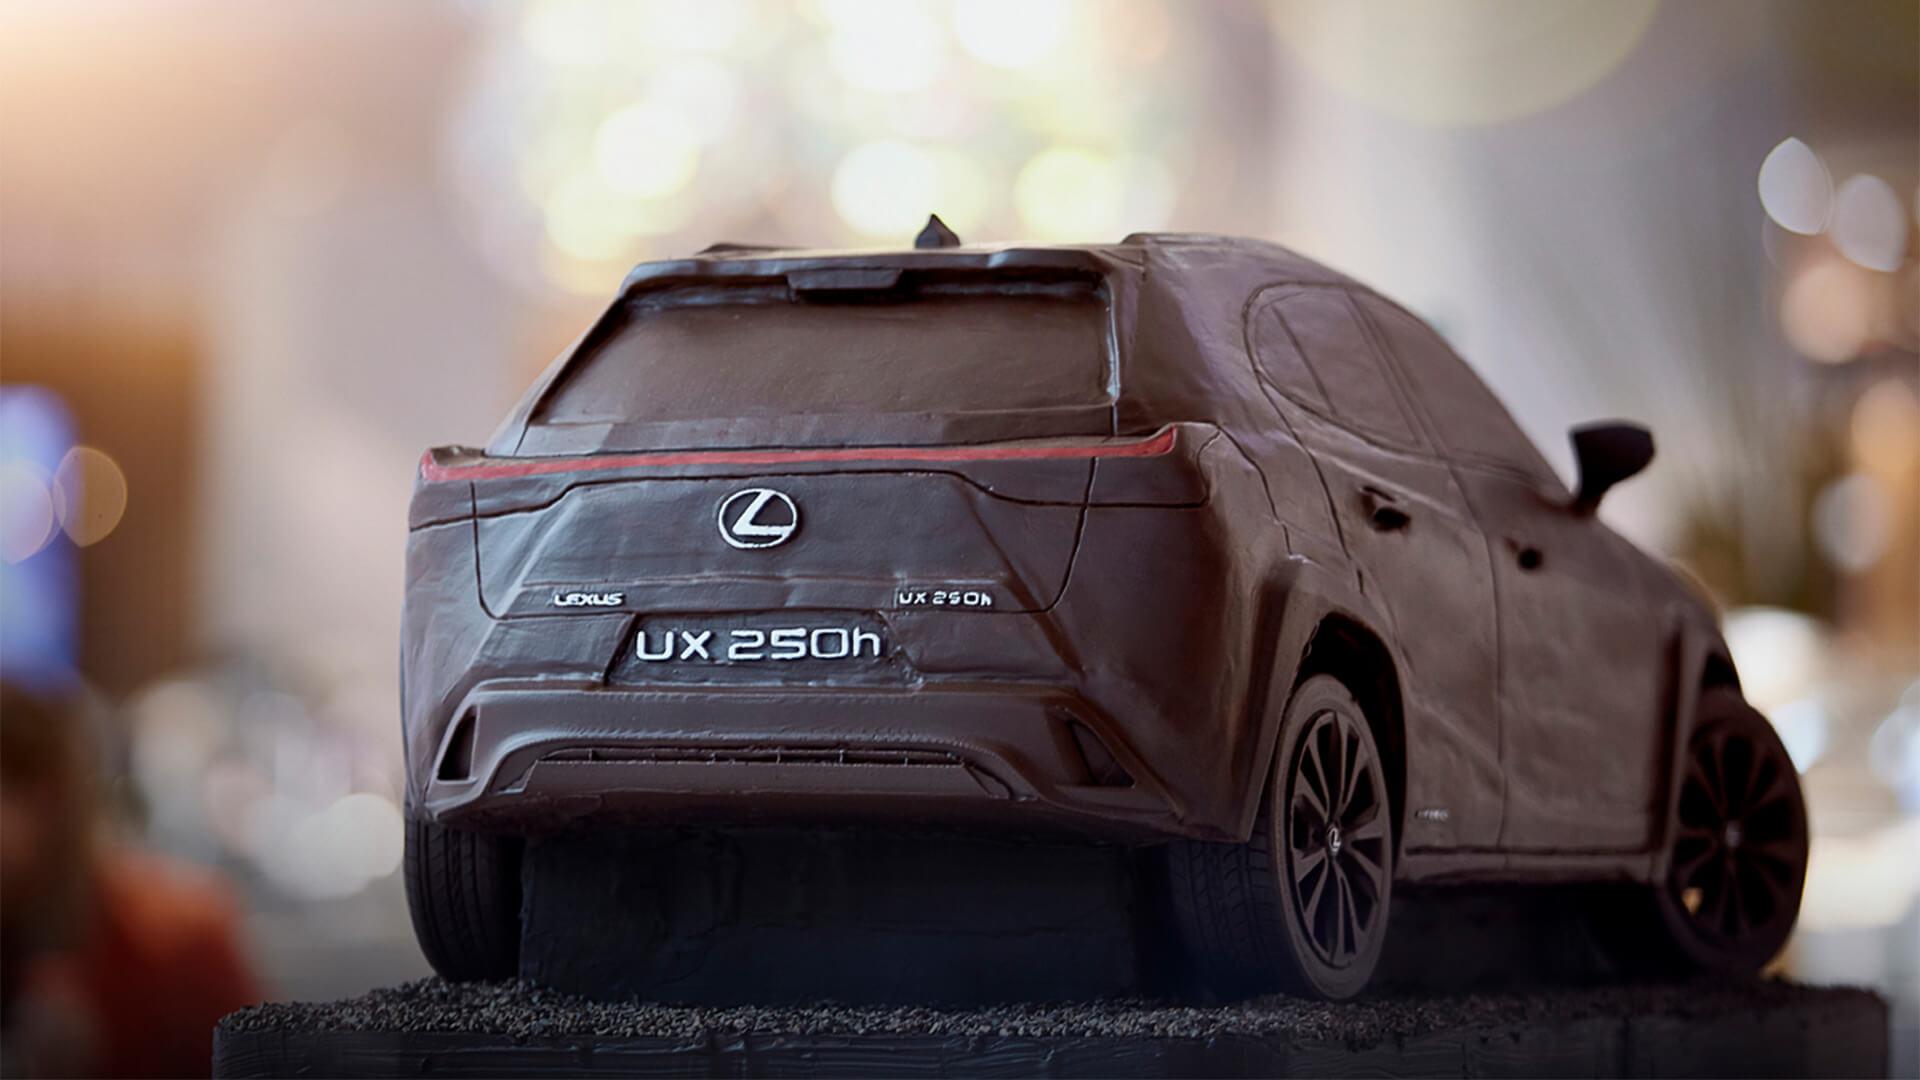 2019 lexus lounge UX Chocolate Car 1920x1080 05